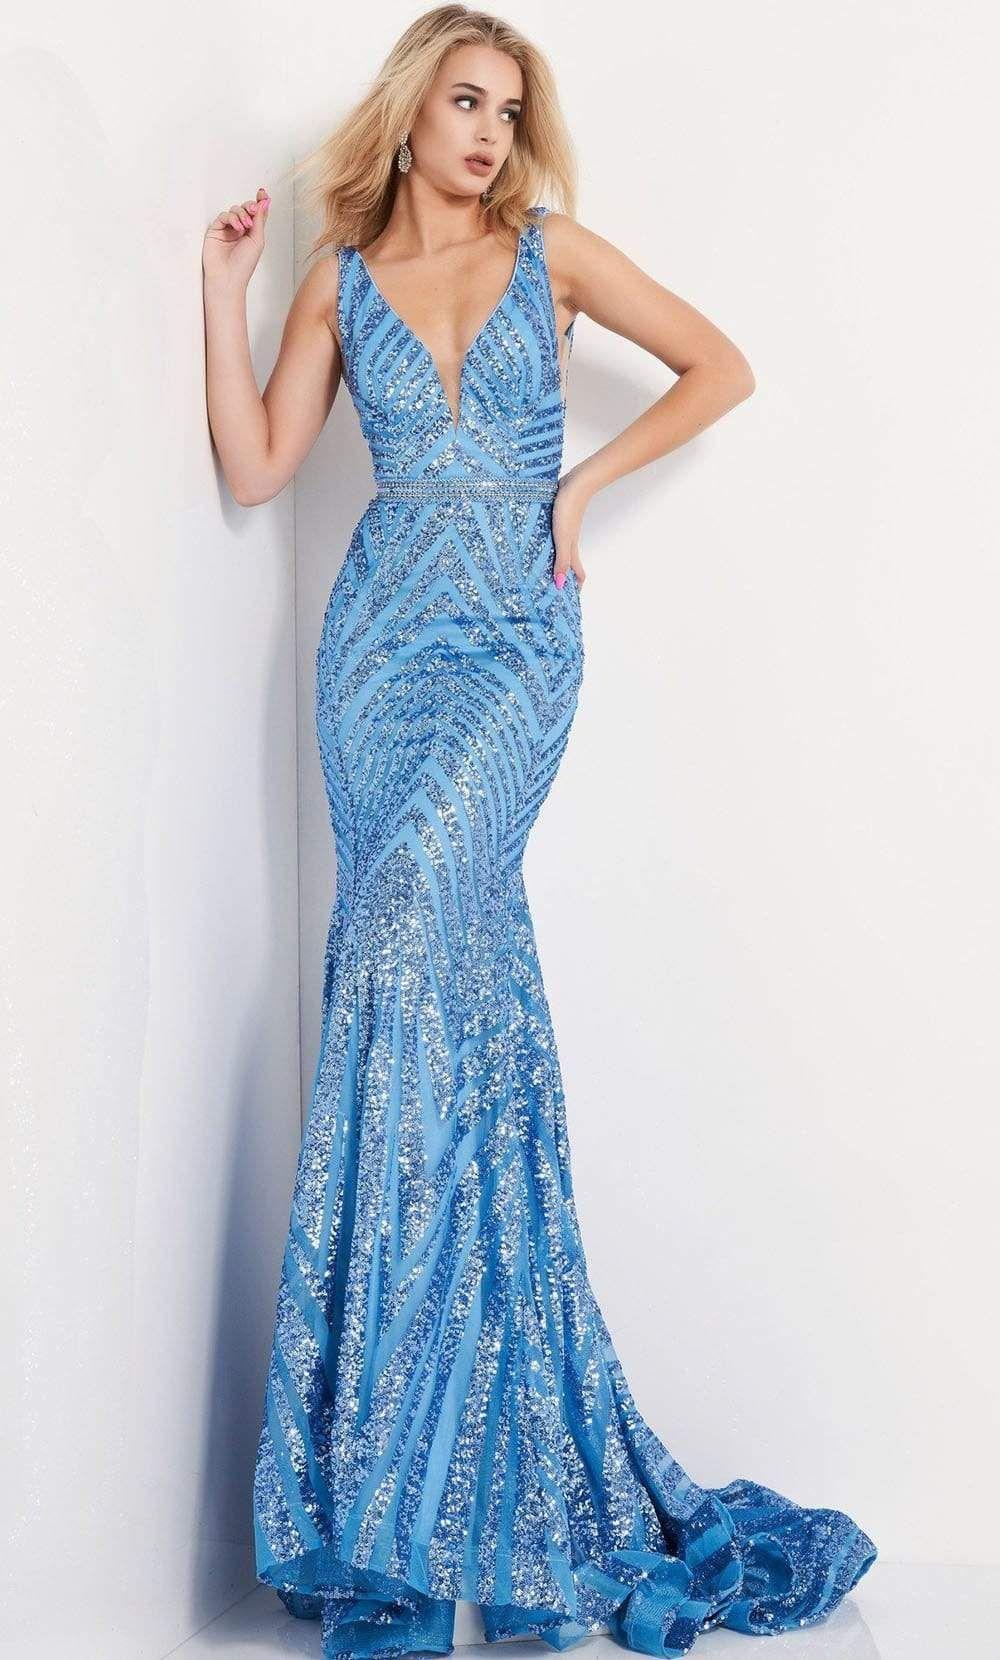 Jovani 03570 Plunging Neck Shimmer Stripe Evening Gown In 2021 Prom Dresses Jovani Prom Dresses Sleeveless Formal Dresses Prom [ 1660 x 1000 Pixel ]